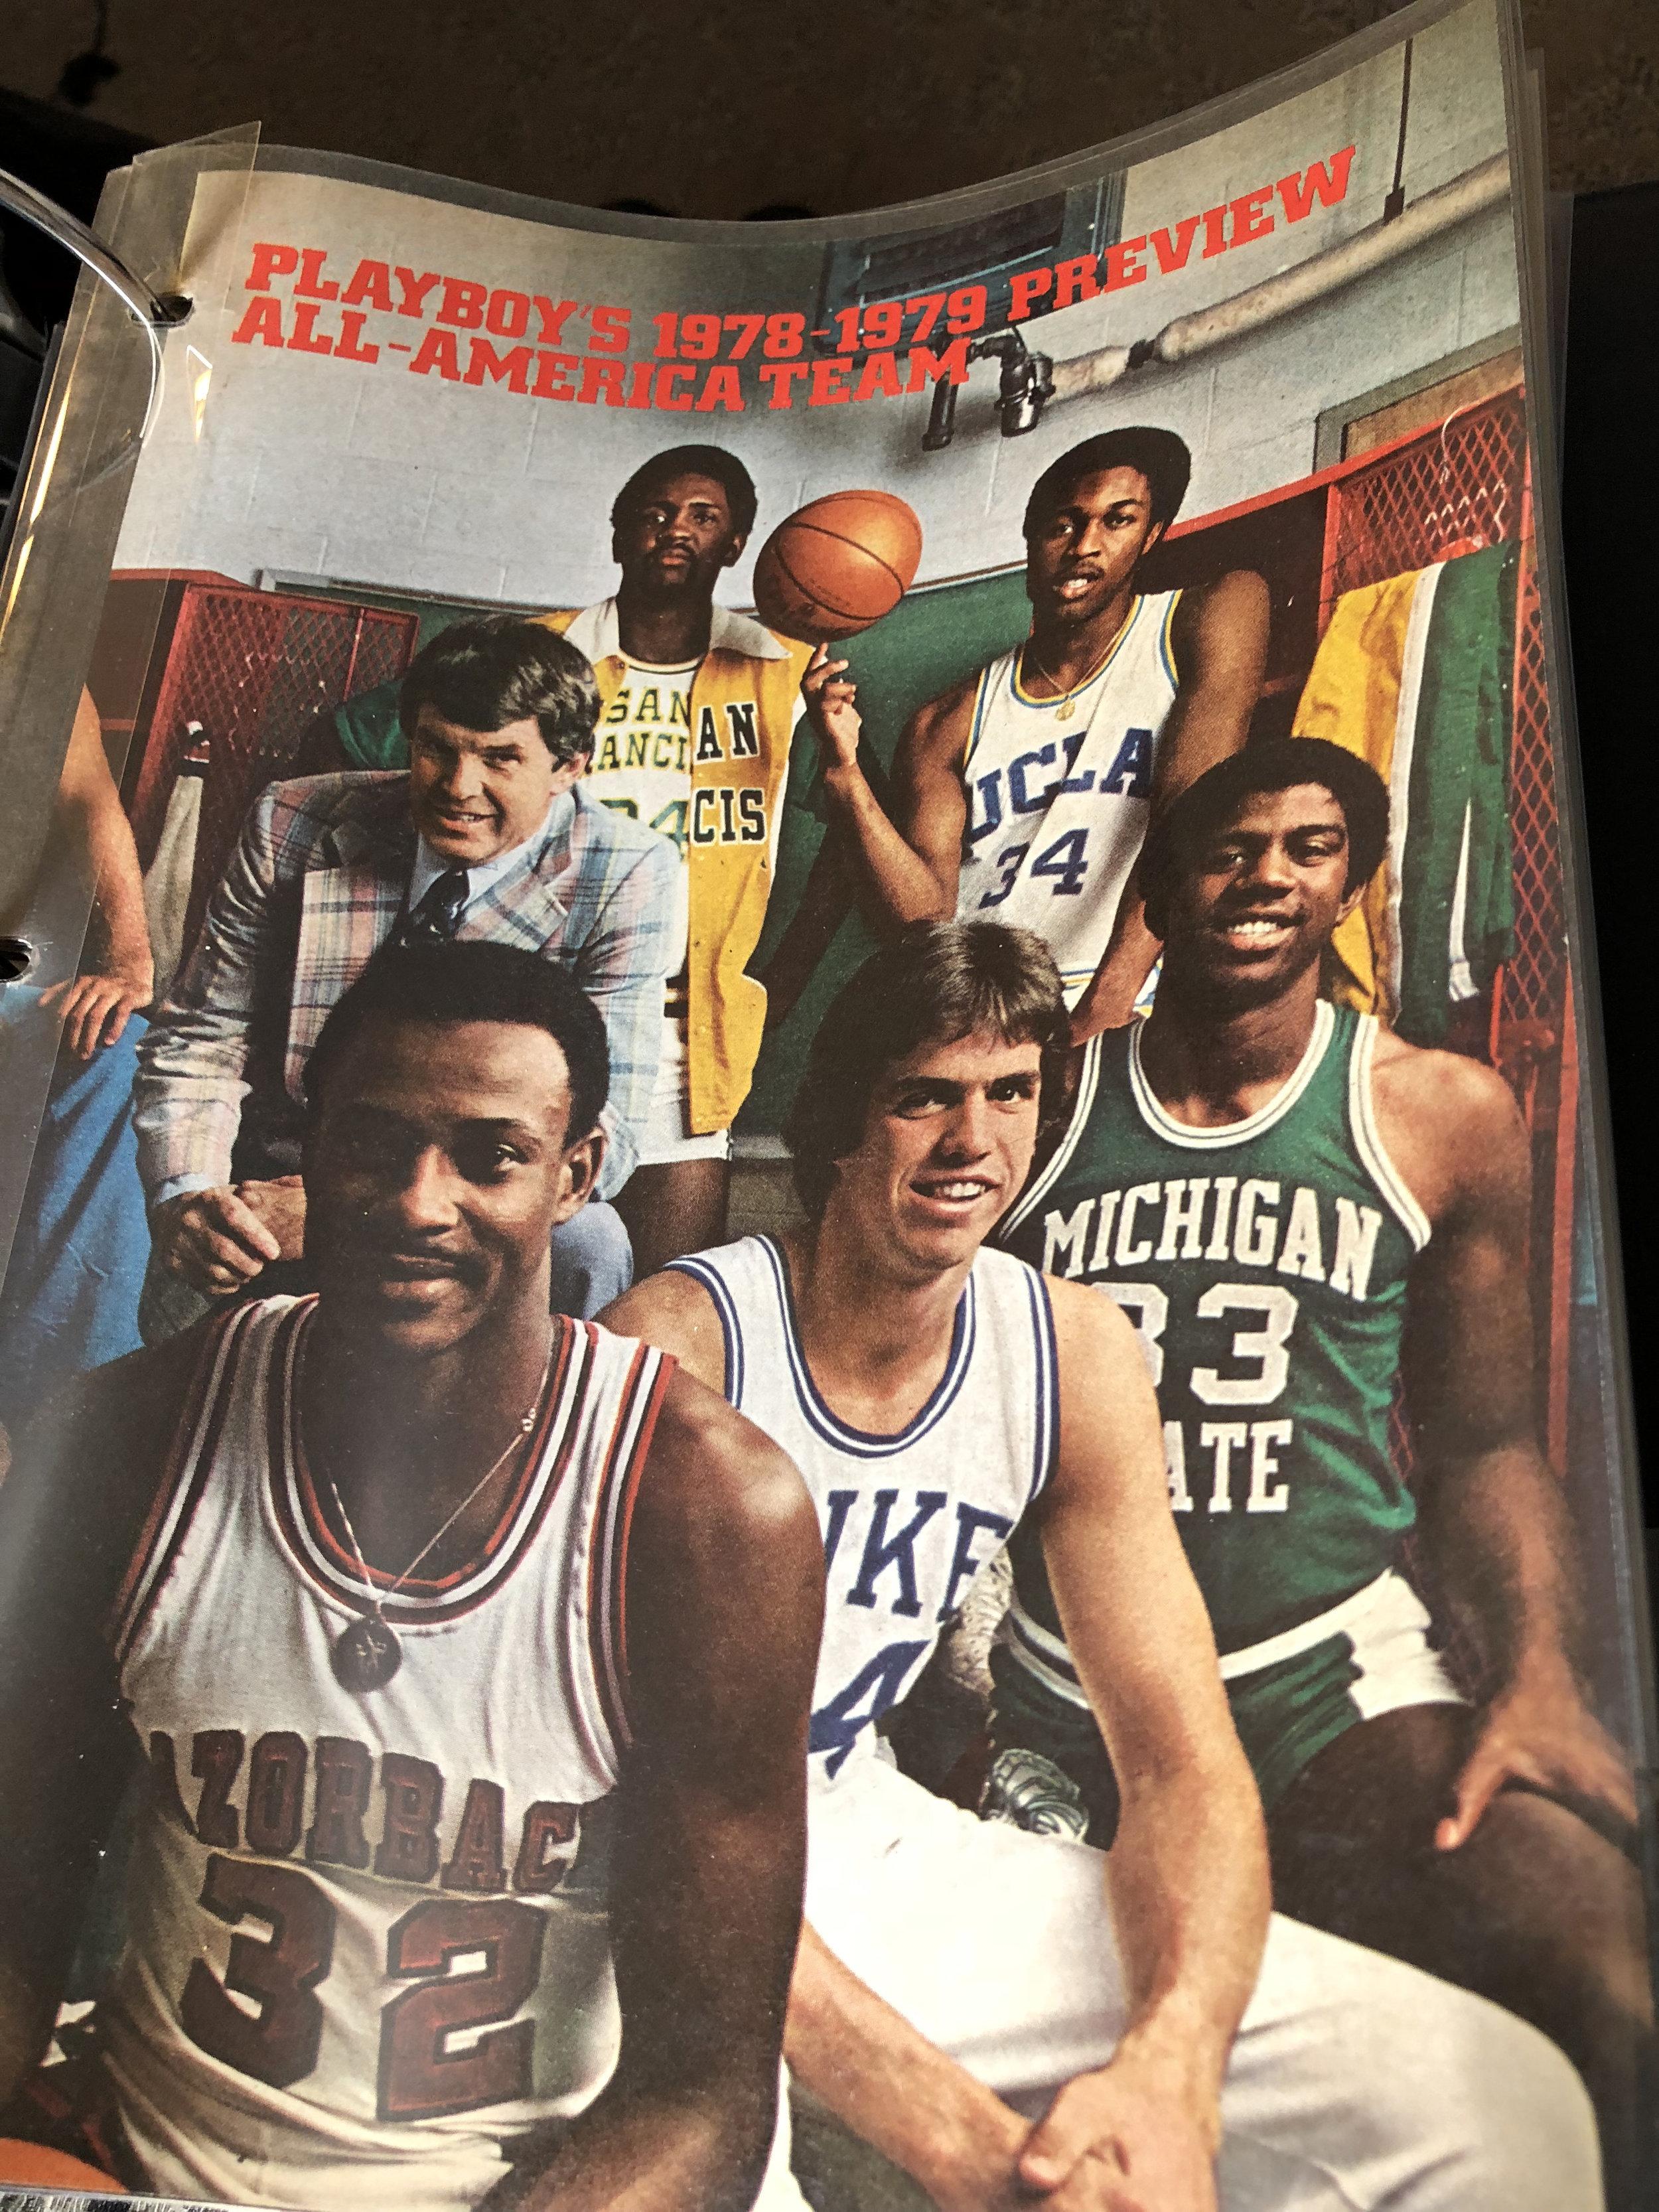 Playboy's 1978-1979 All-American Team